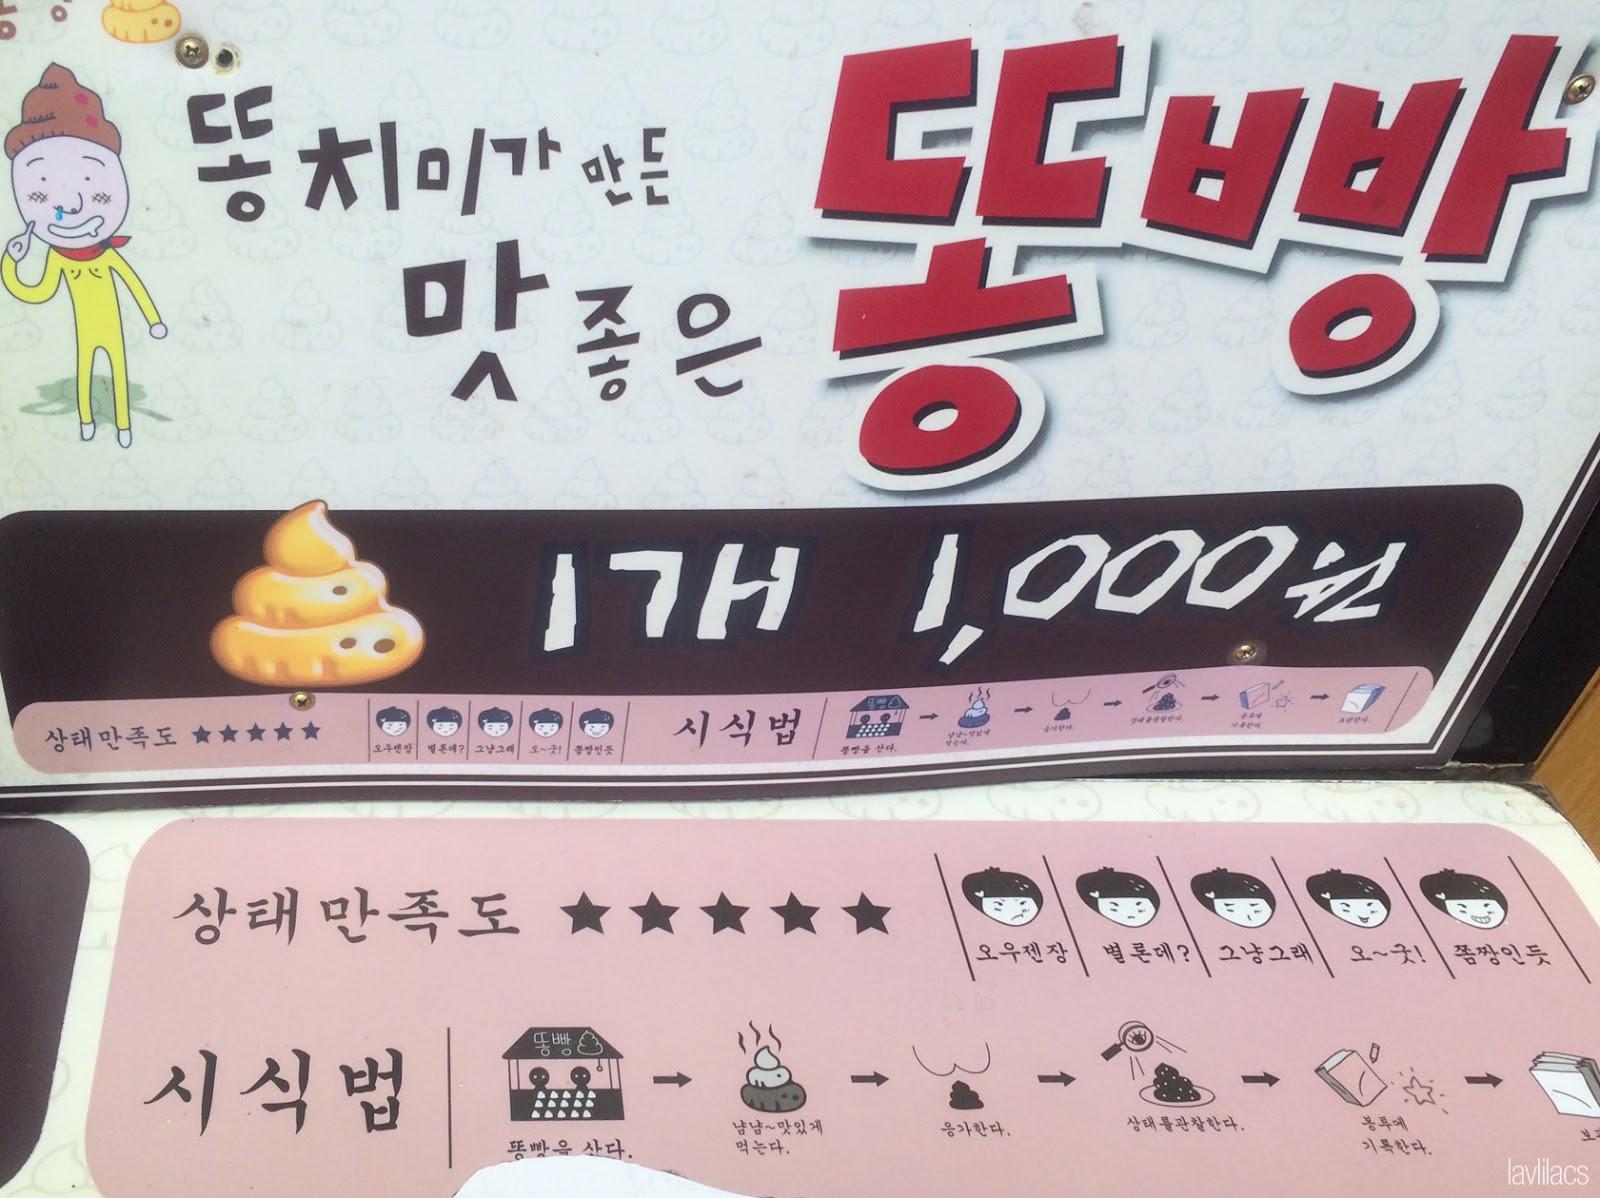 Seoul, Korea - Summer Study Abroad 2014 - Seoul City Touring - Insadong 인사동 仁寺洞 - Ssamziegil 쌈지길 poop bread